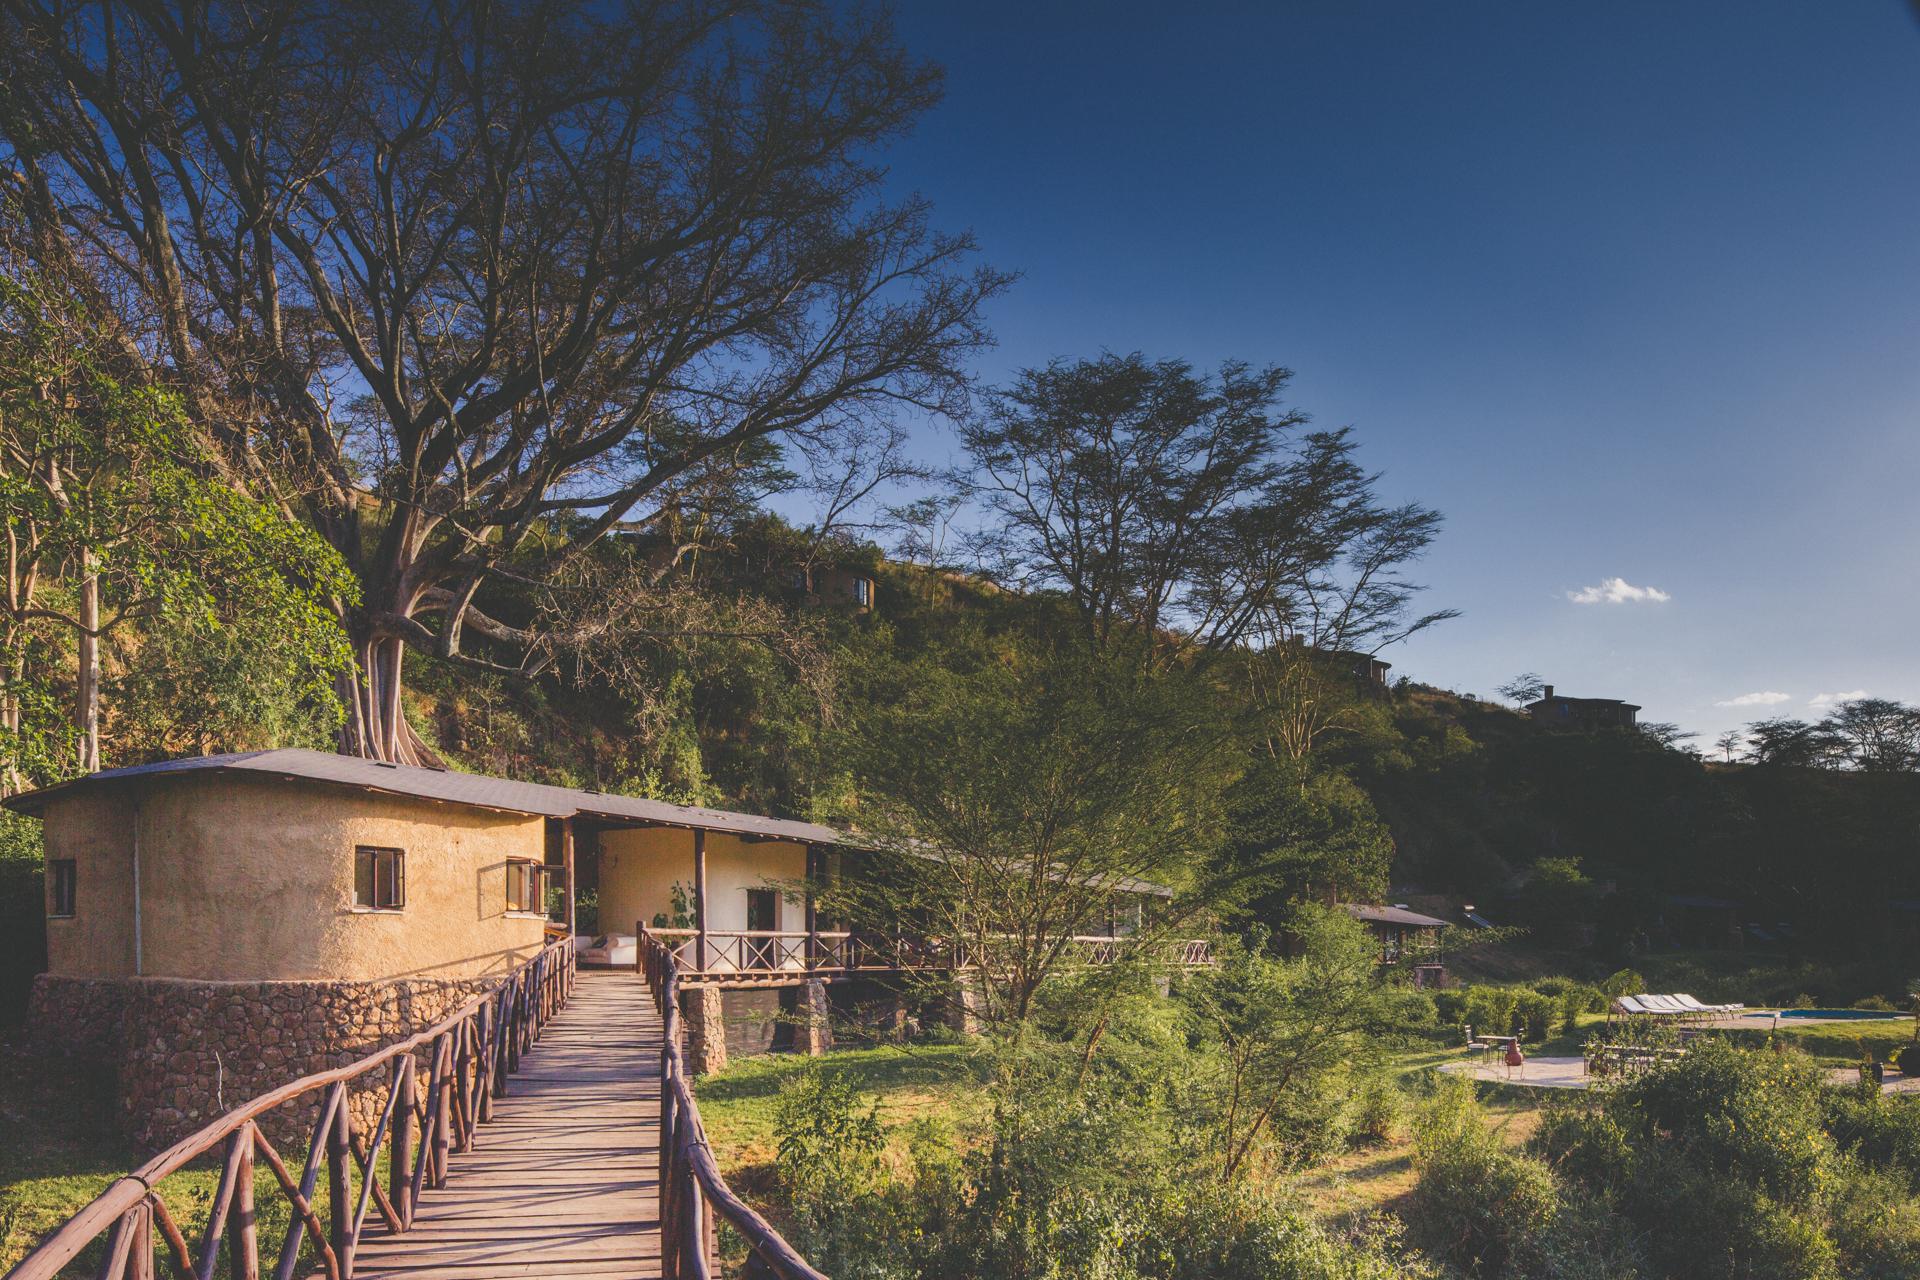 Emakoko Kenya Exterior